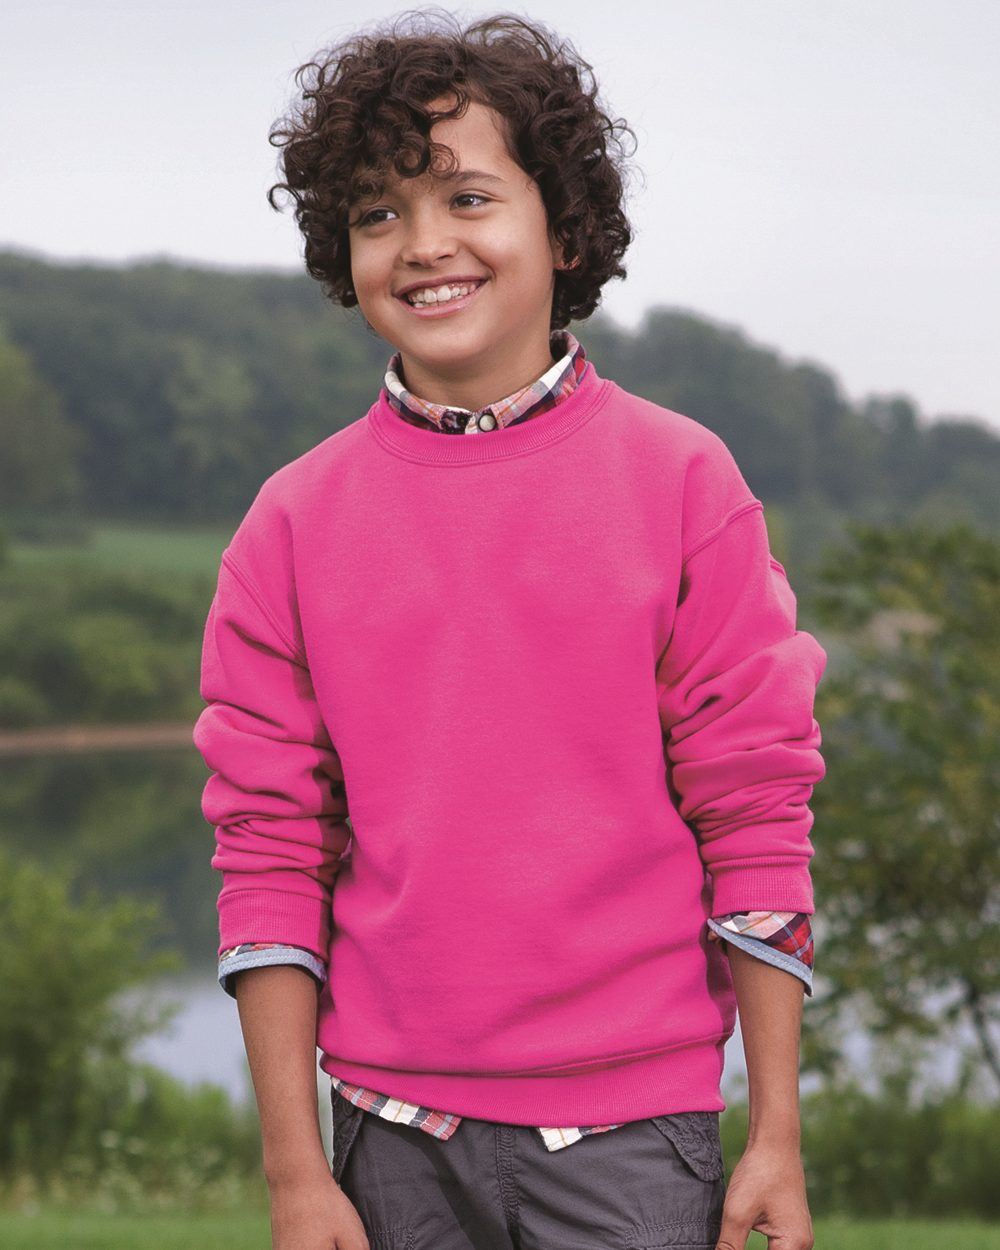 JERZEES 562BR - NuBlend Youth Crewneck Sweatshirt